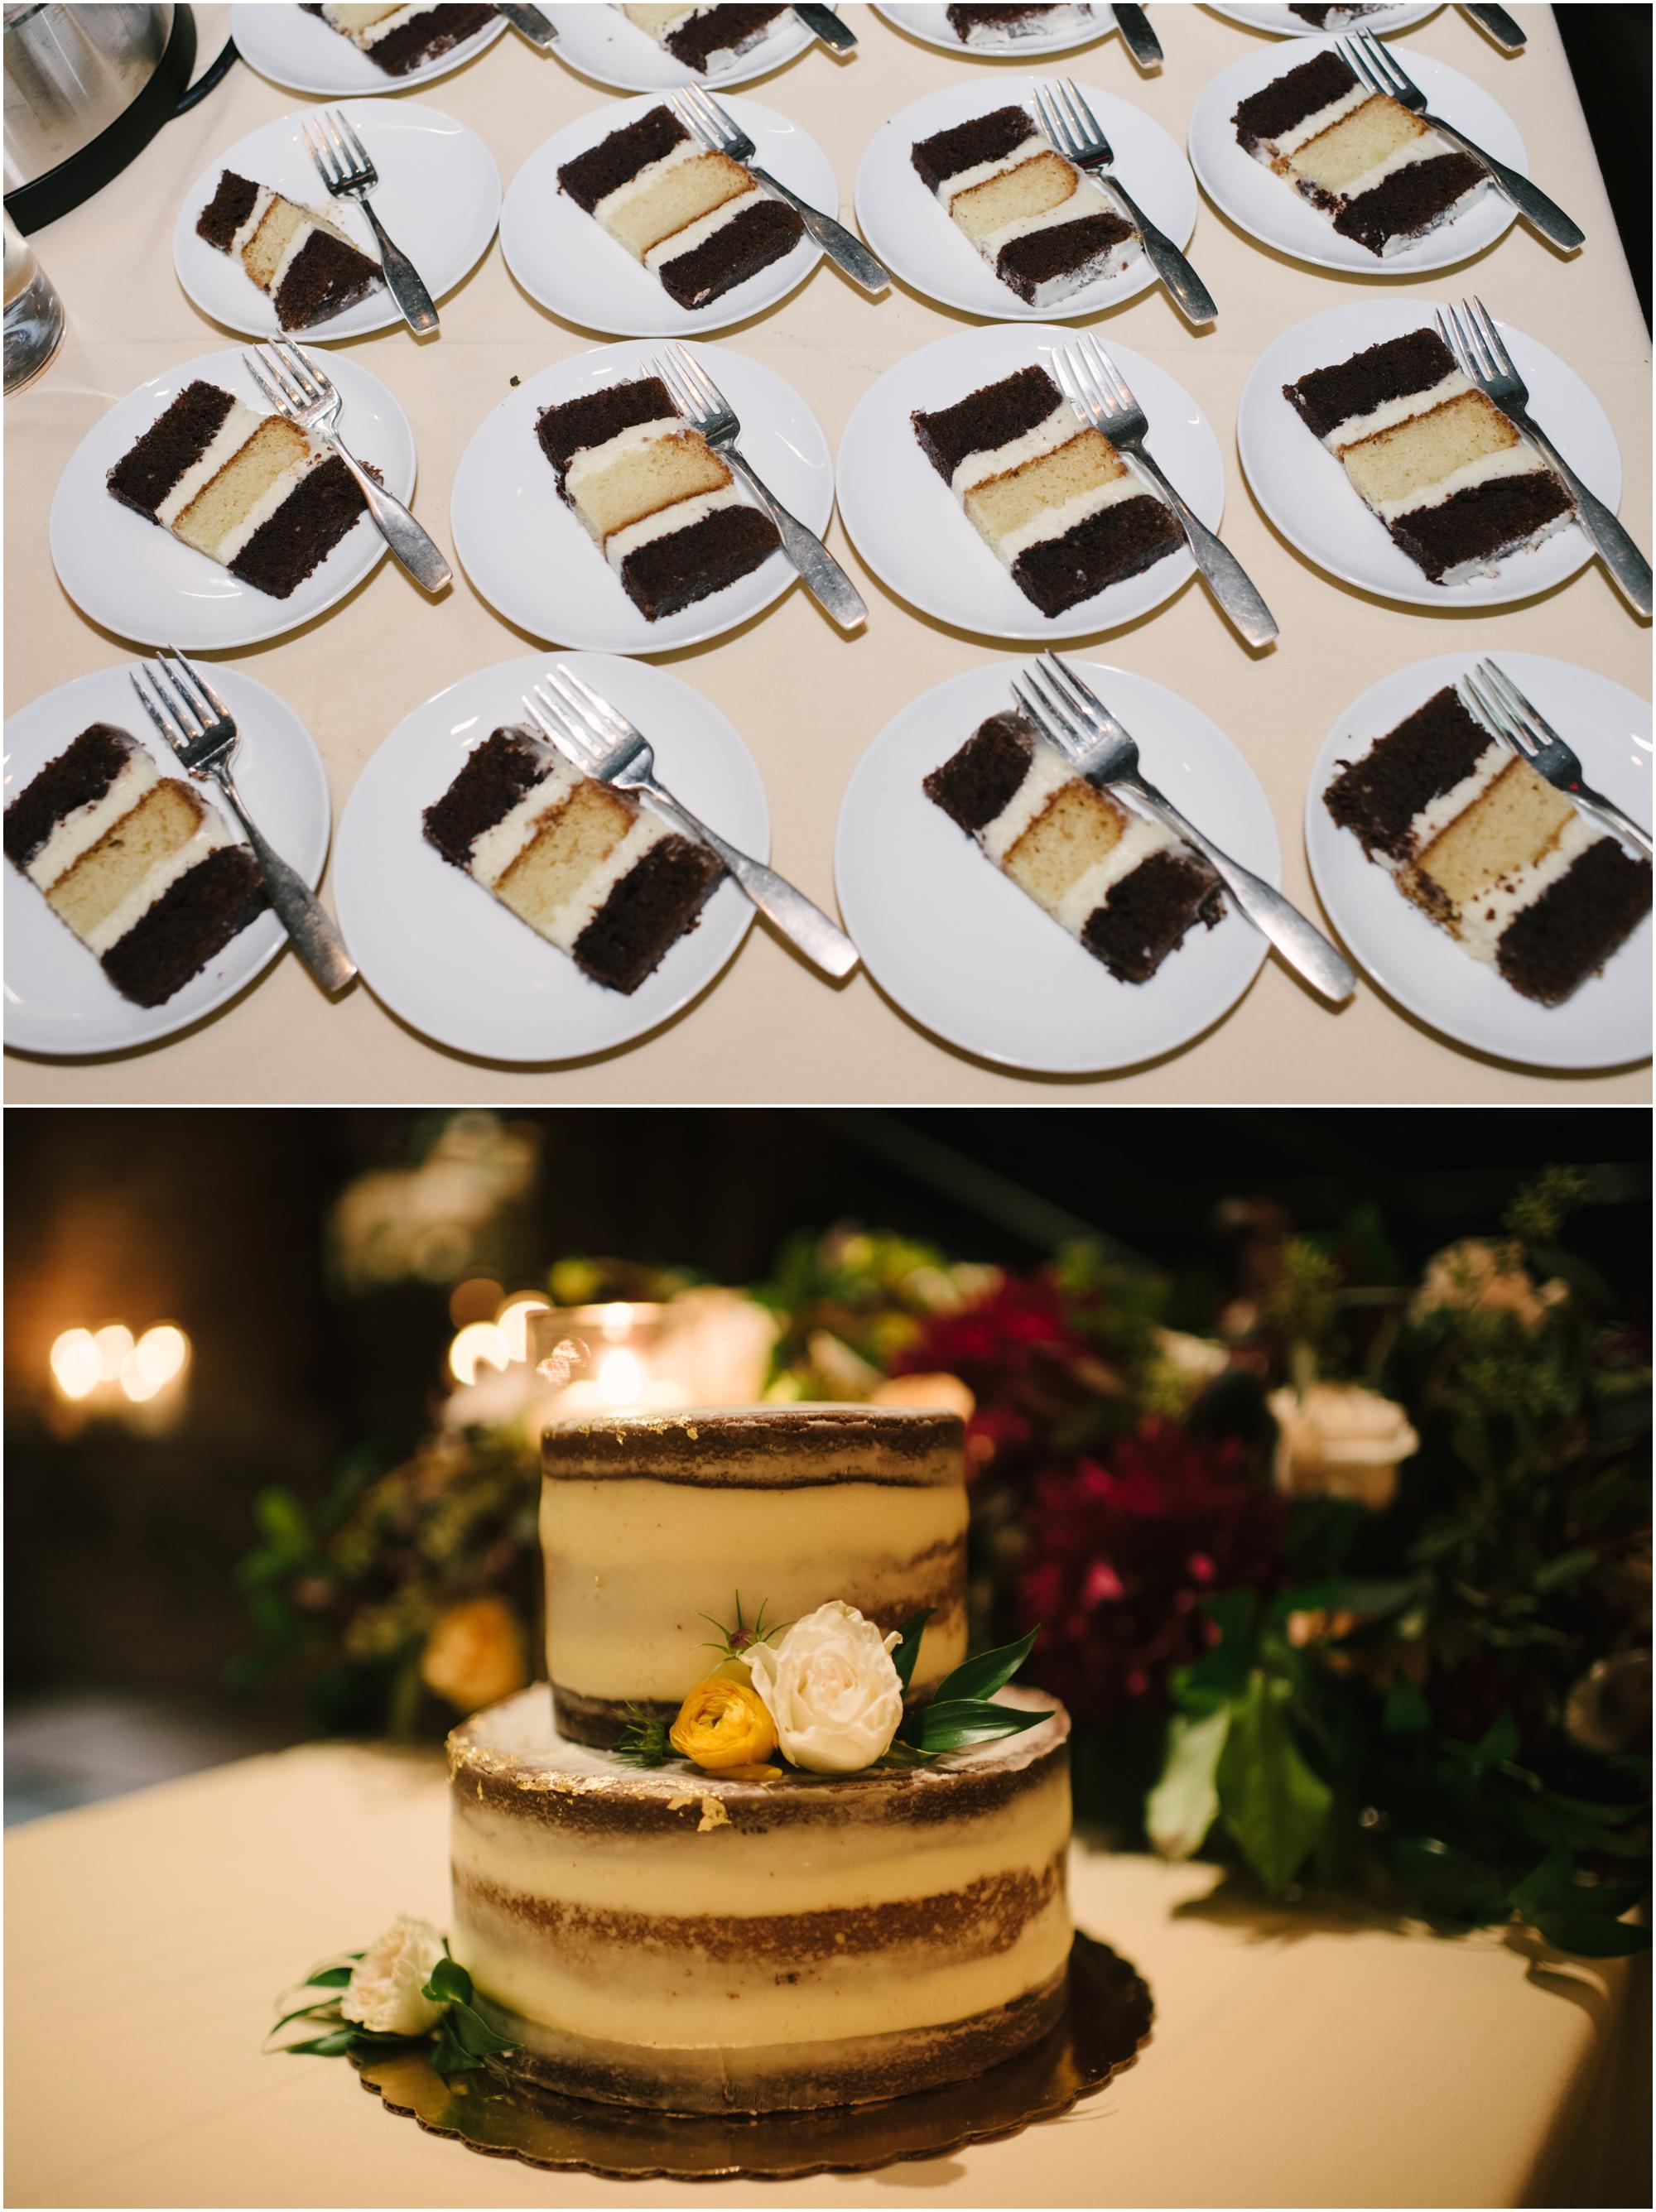 gay-wedding-photographer-williamsburgphotostudios-thefoundry-wedding-photographer_0022.jpg